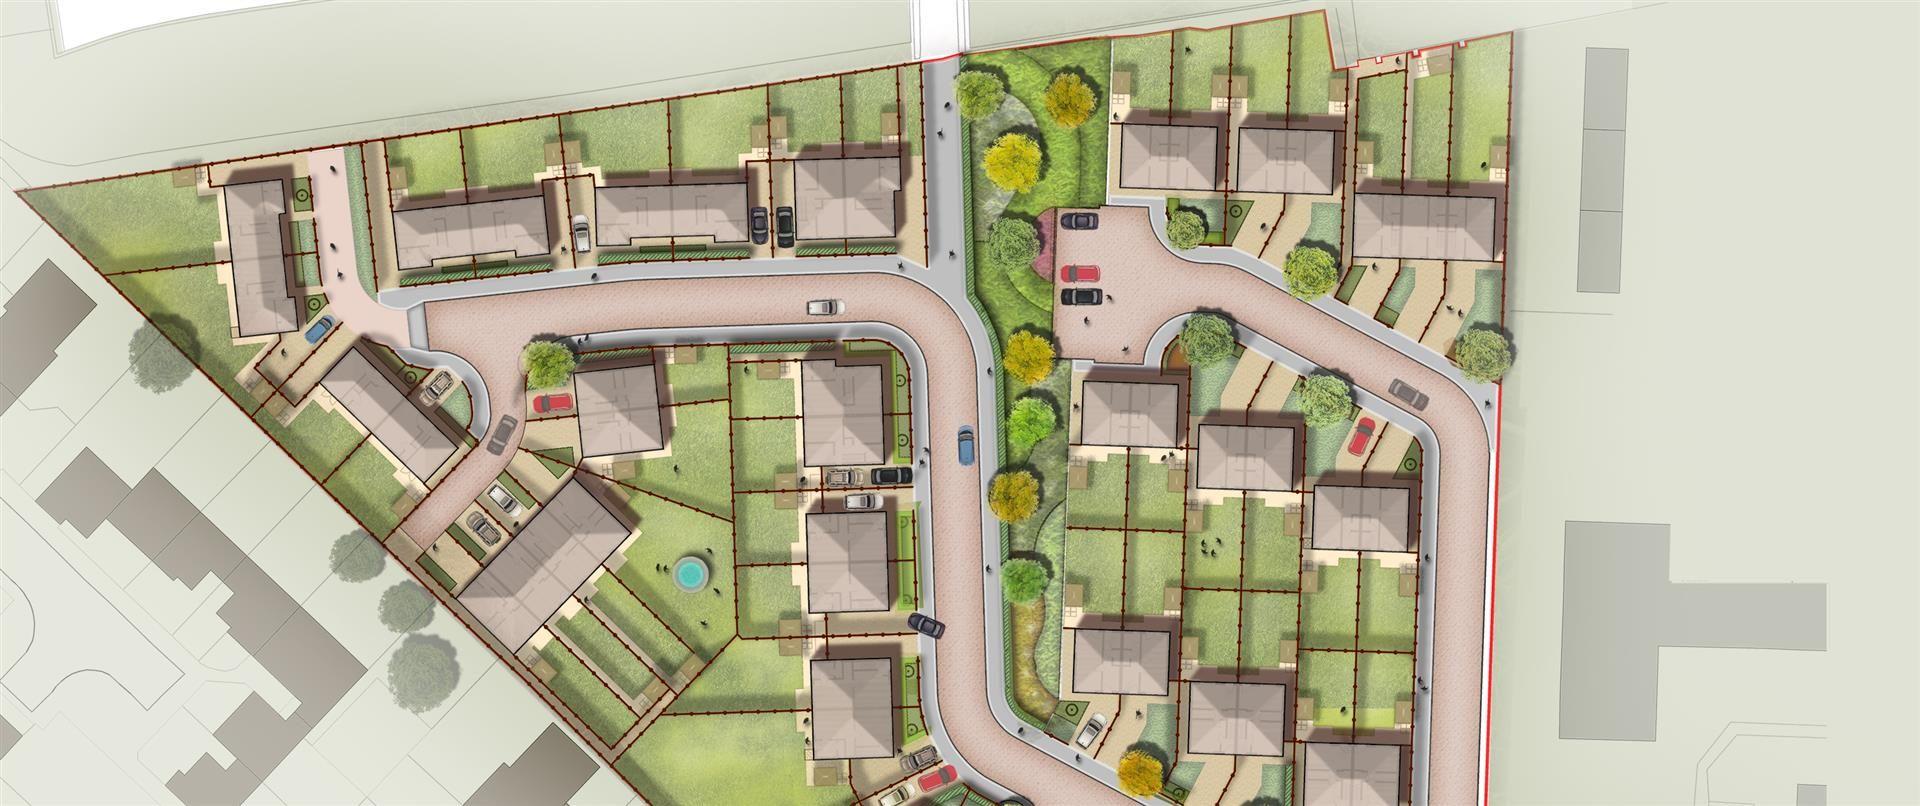 landscape plan residential housing